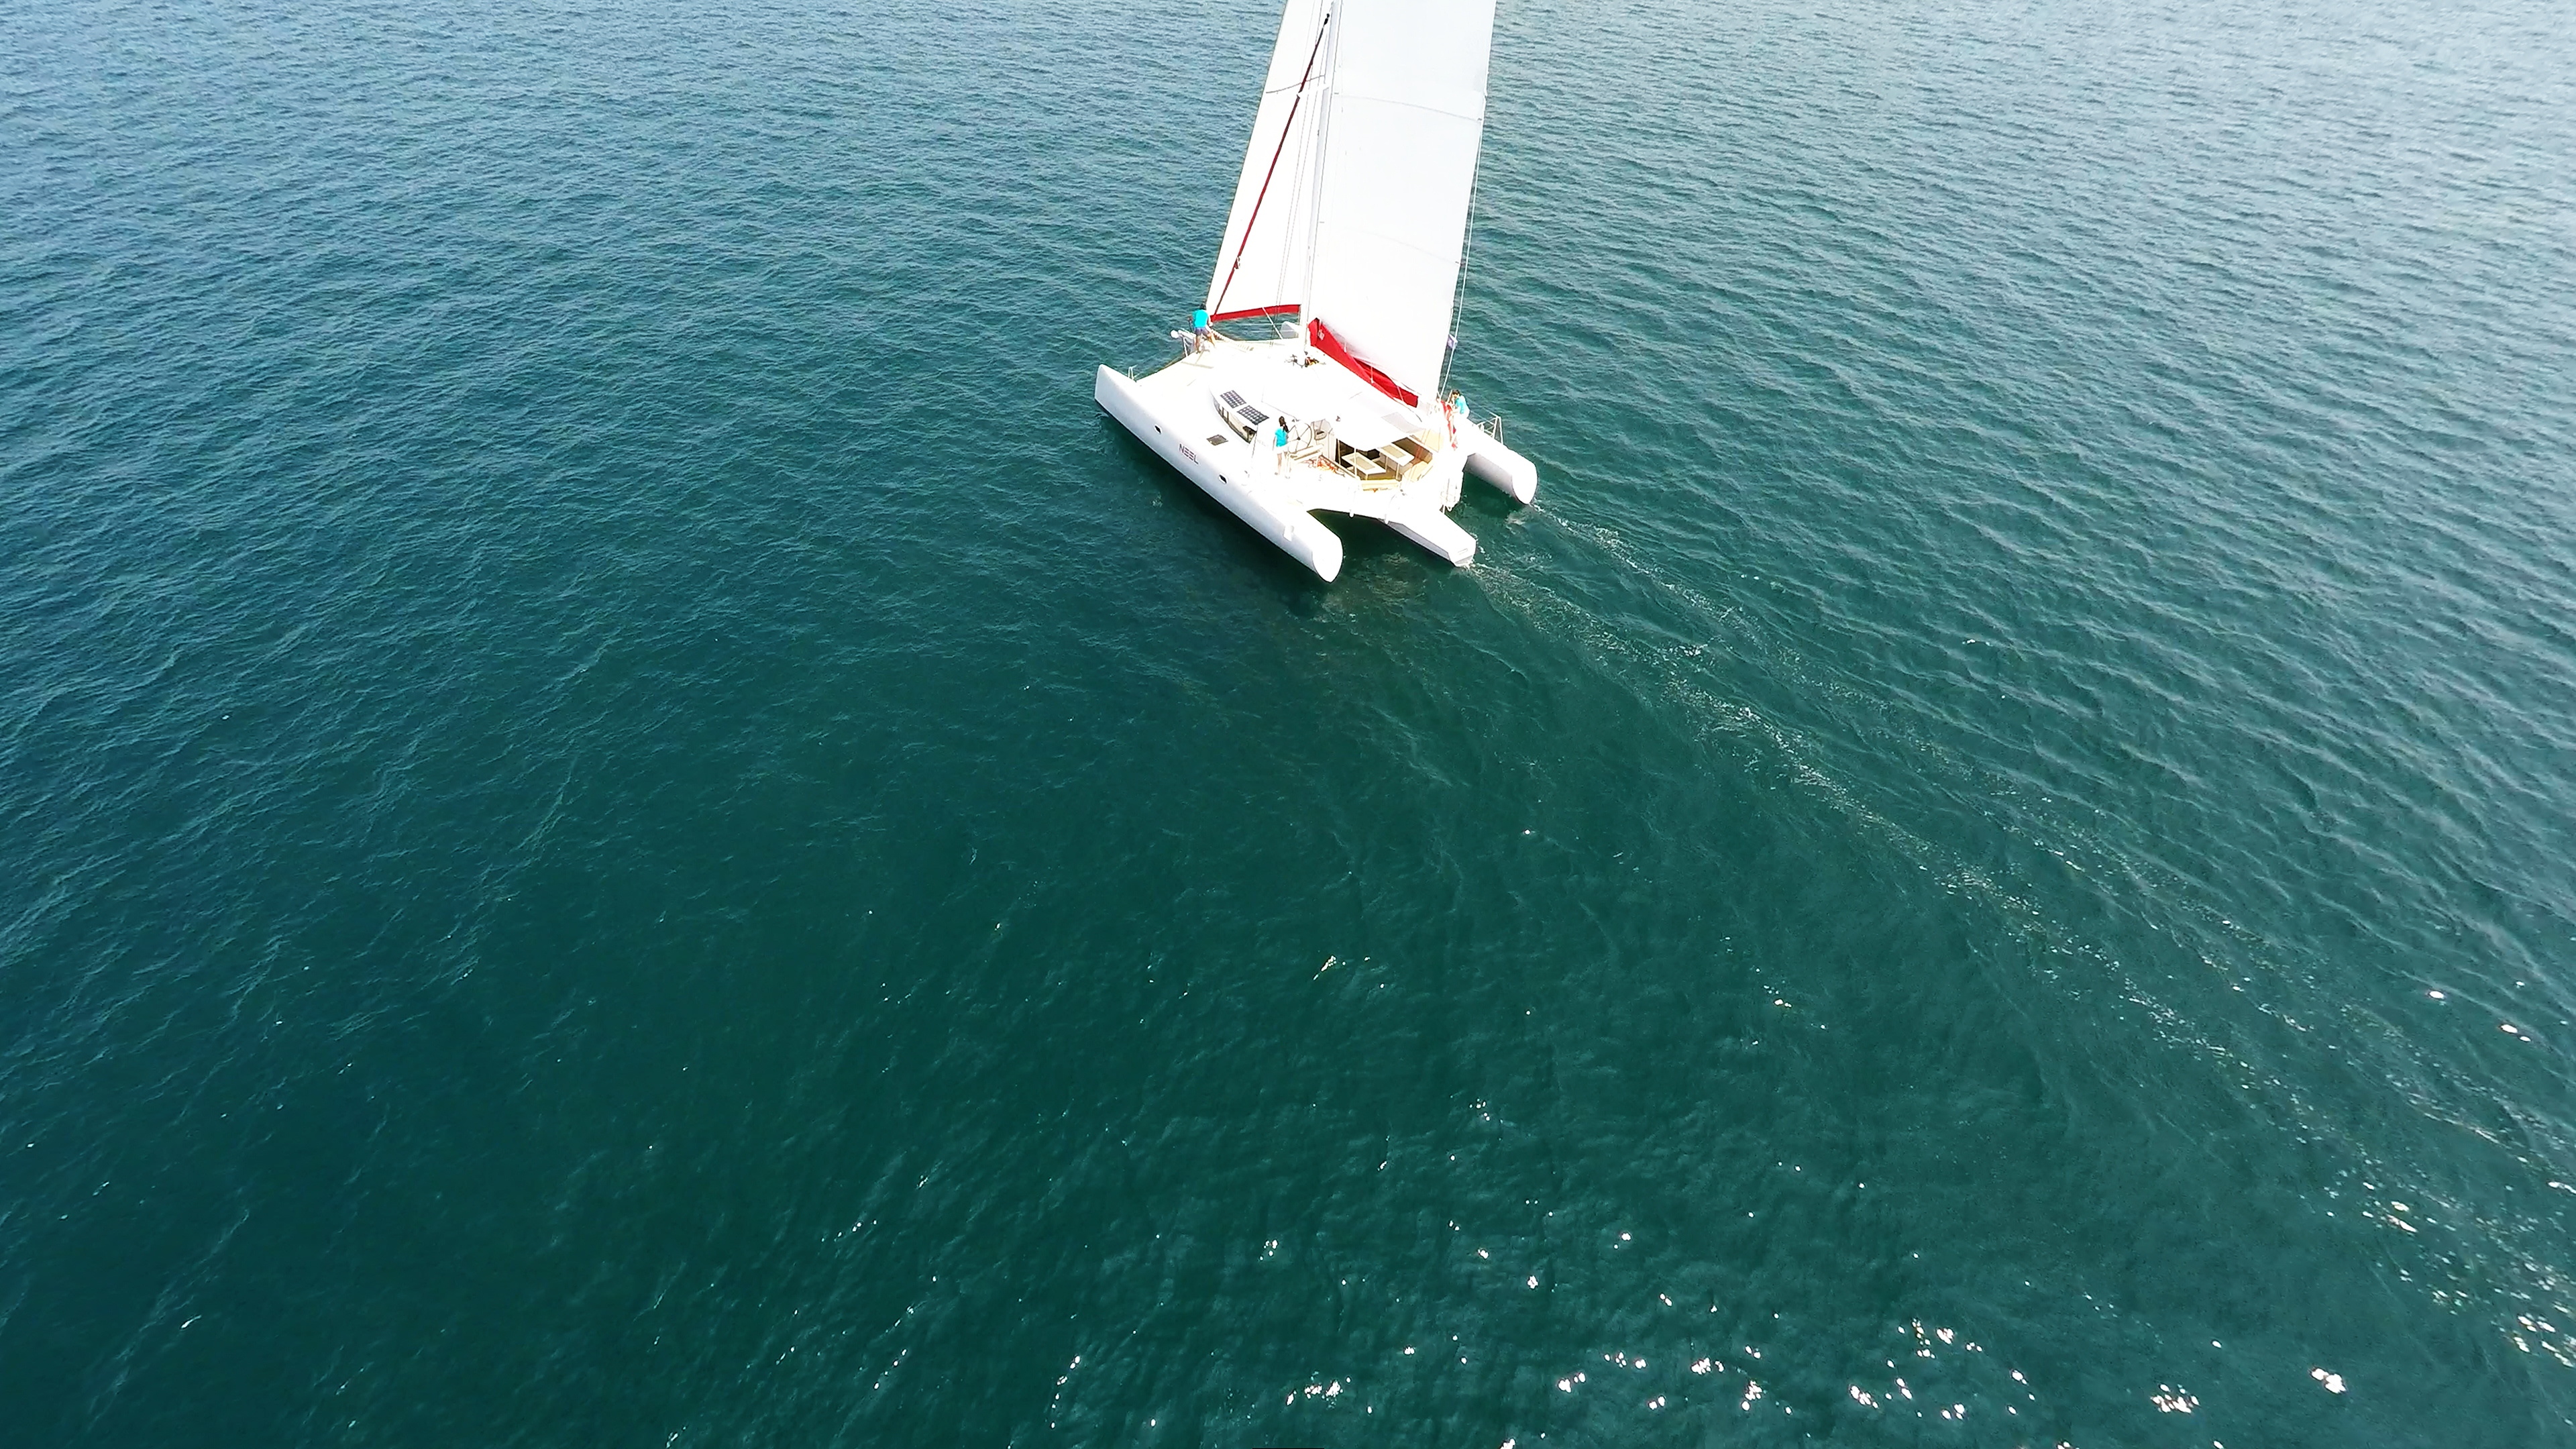 trimarano naviga a vela al mare 1